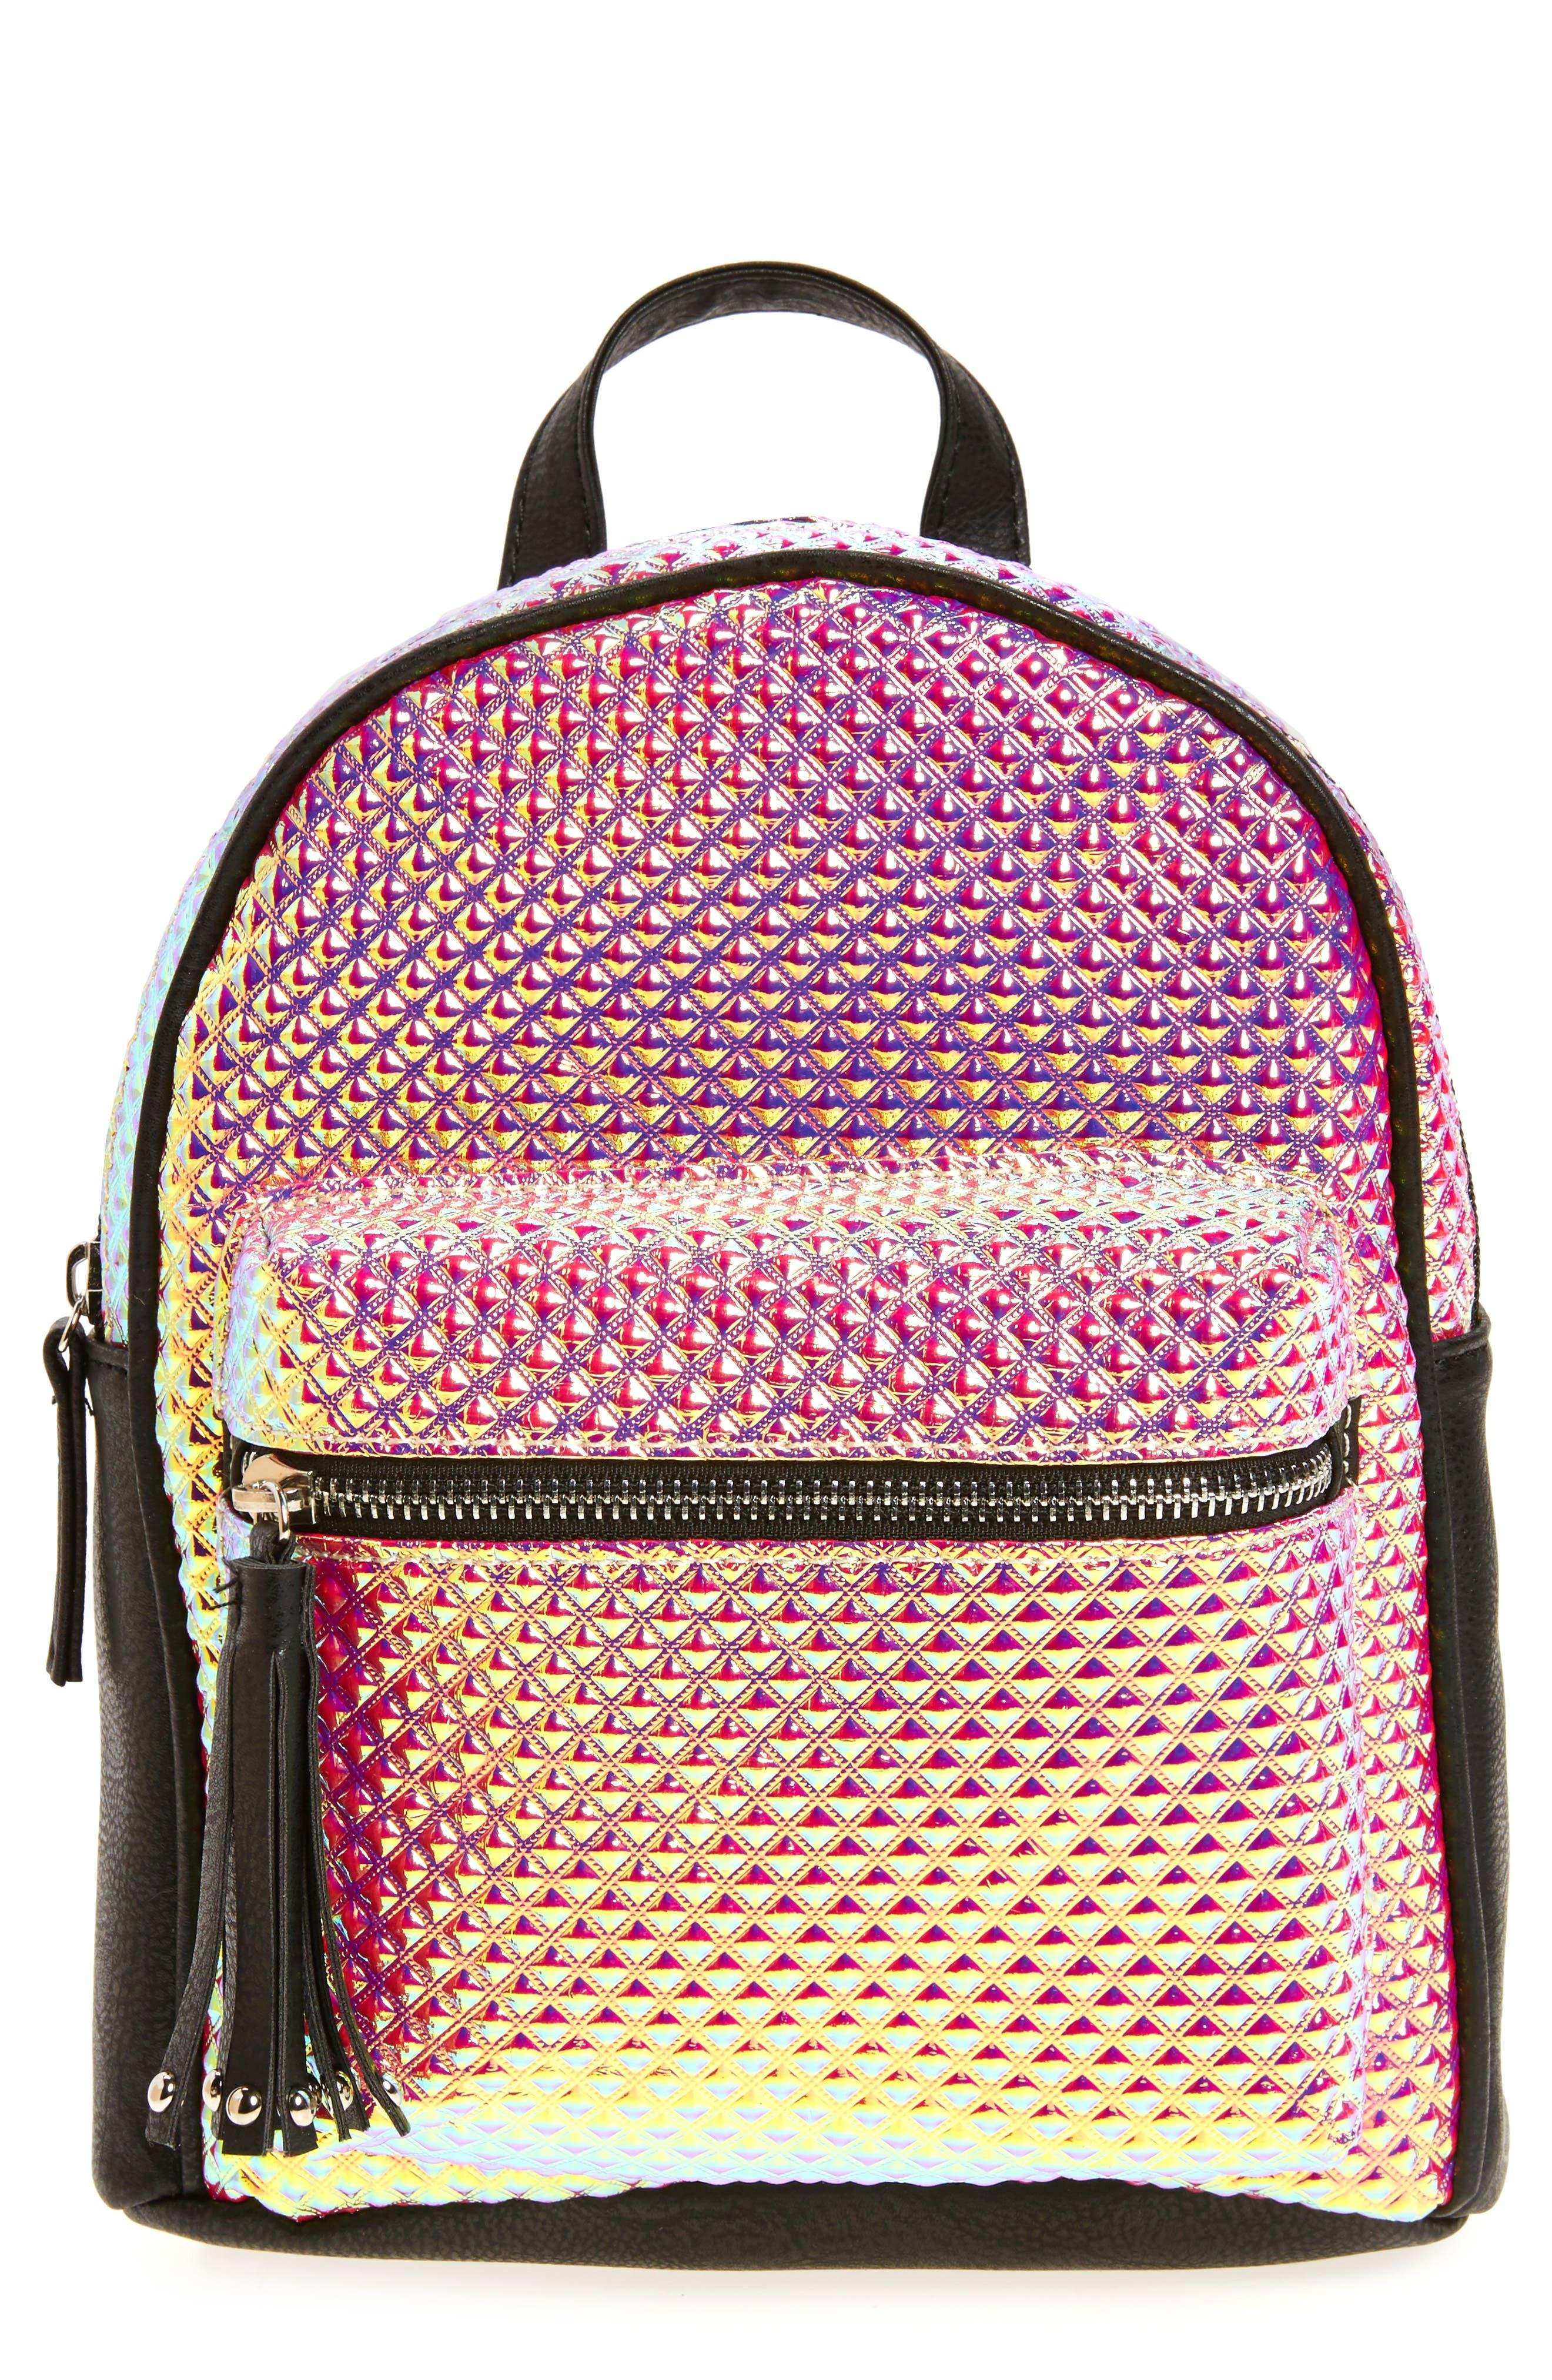 Alternate Image 1 Selected - OMG Hologram Mini Backpack (Kids)